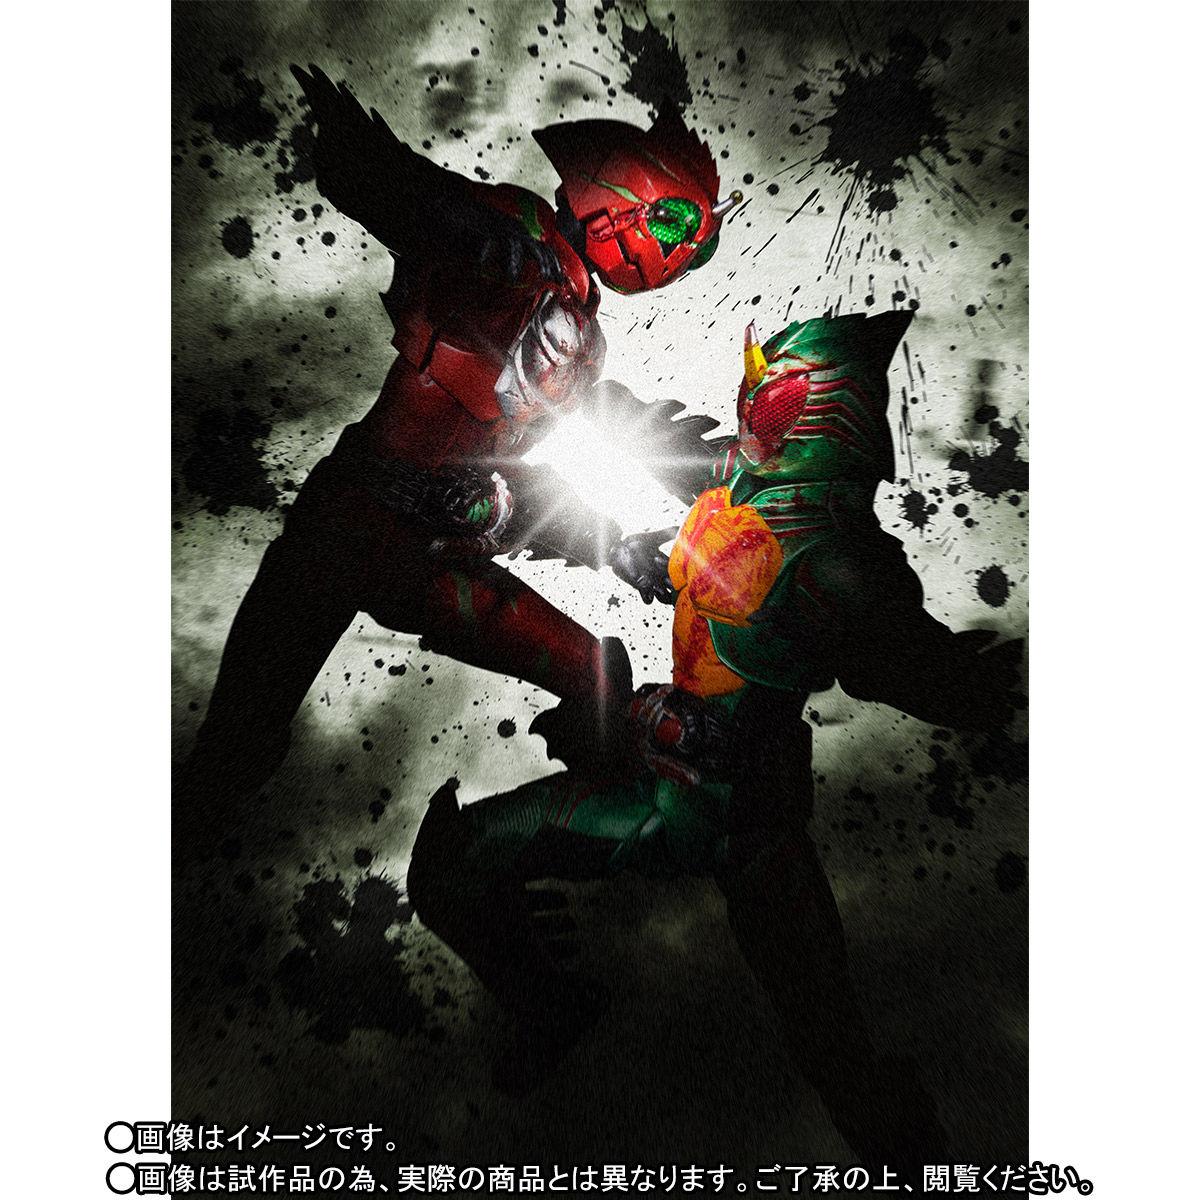 S.H.フィギュアーツ『仮面ライダーアマゾンズ 最後ノ審判セット』可動フィギュア-002